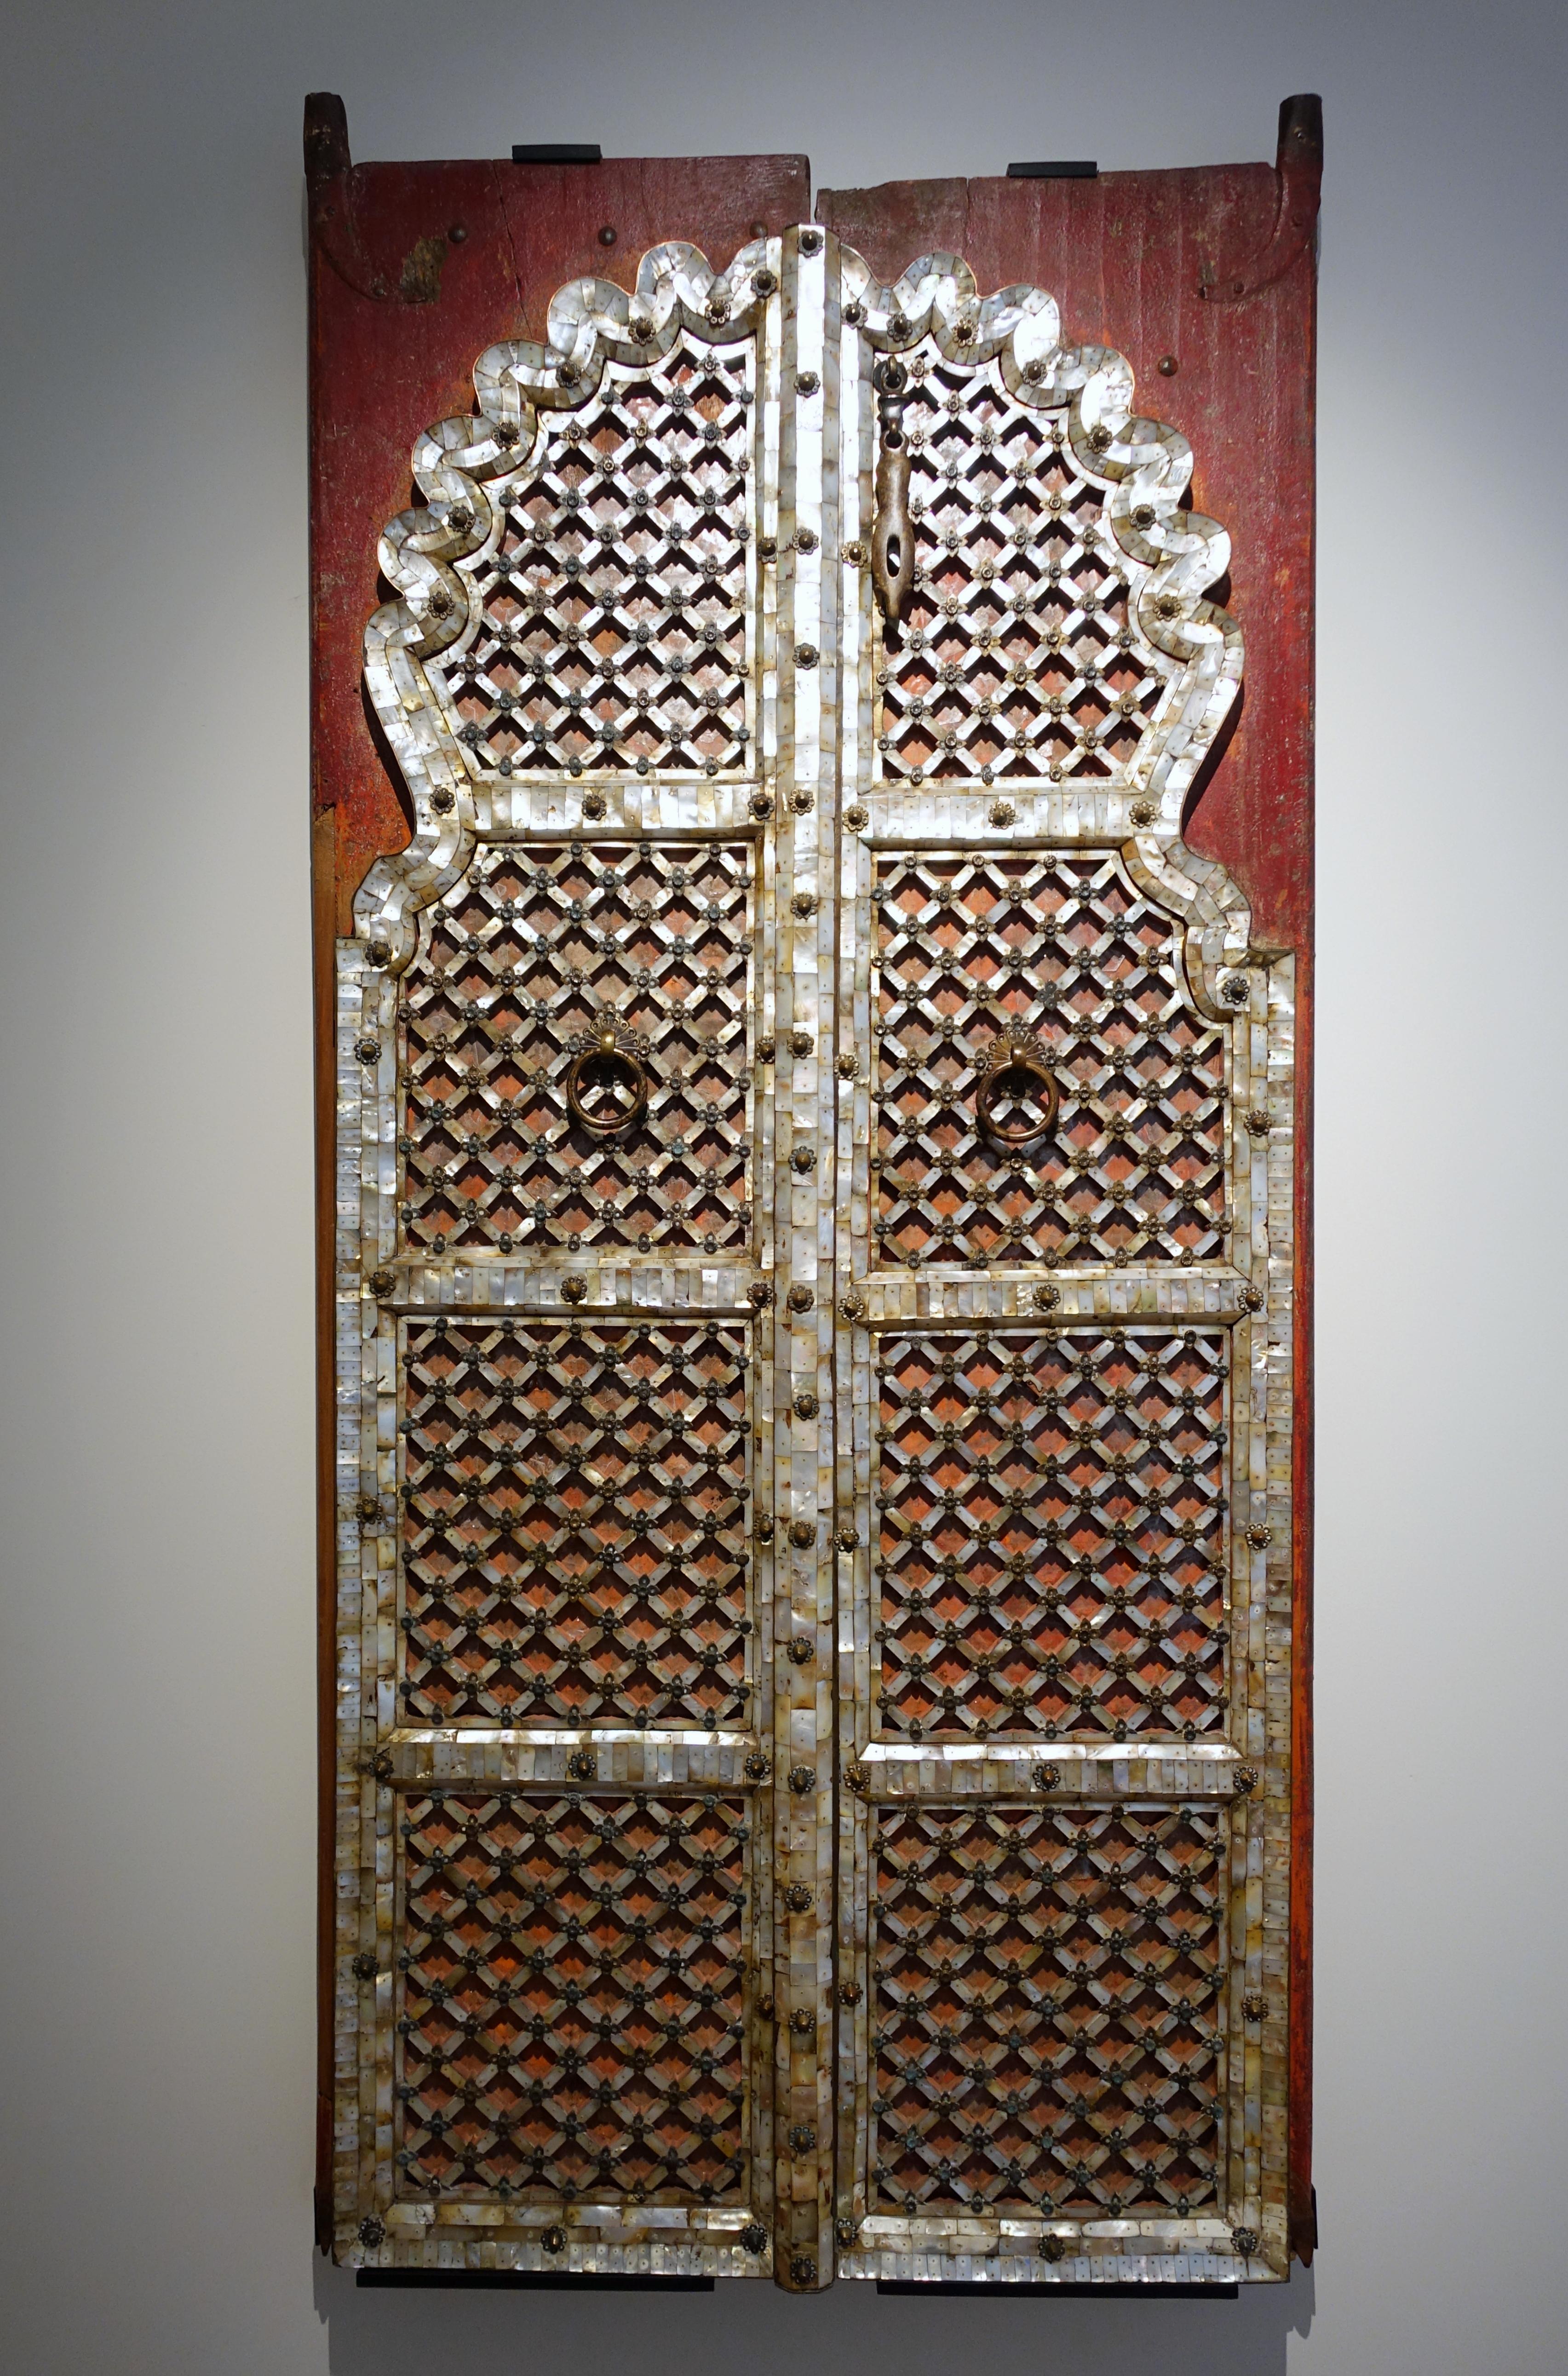 FileDoor probably India Gujarat (historic Hindustan) 19th to 20th & File:Door probably India Gujarat (historic Hindustan) 19th to ...